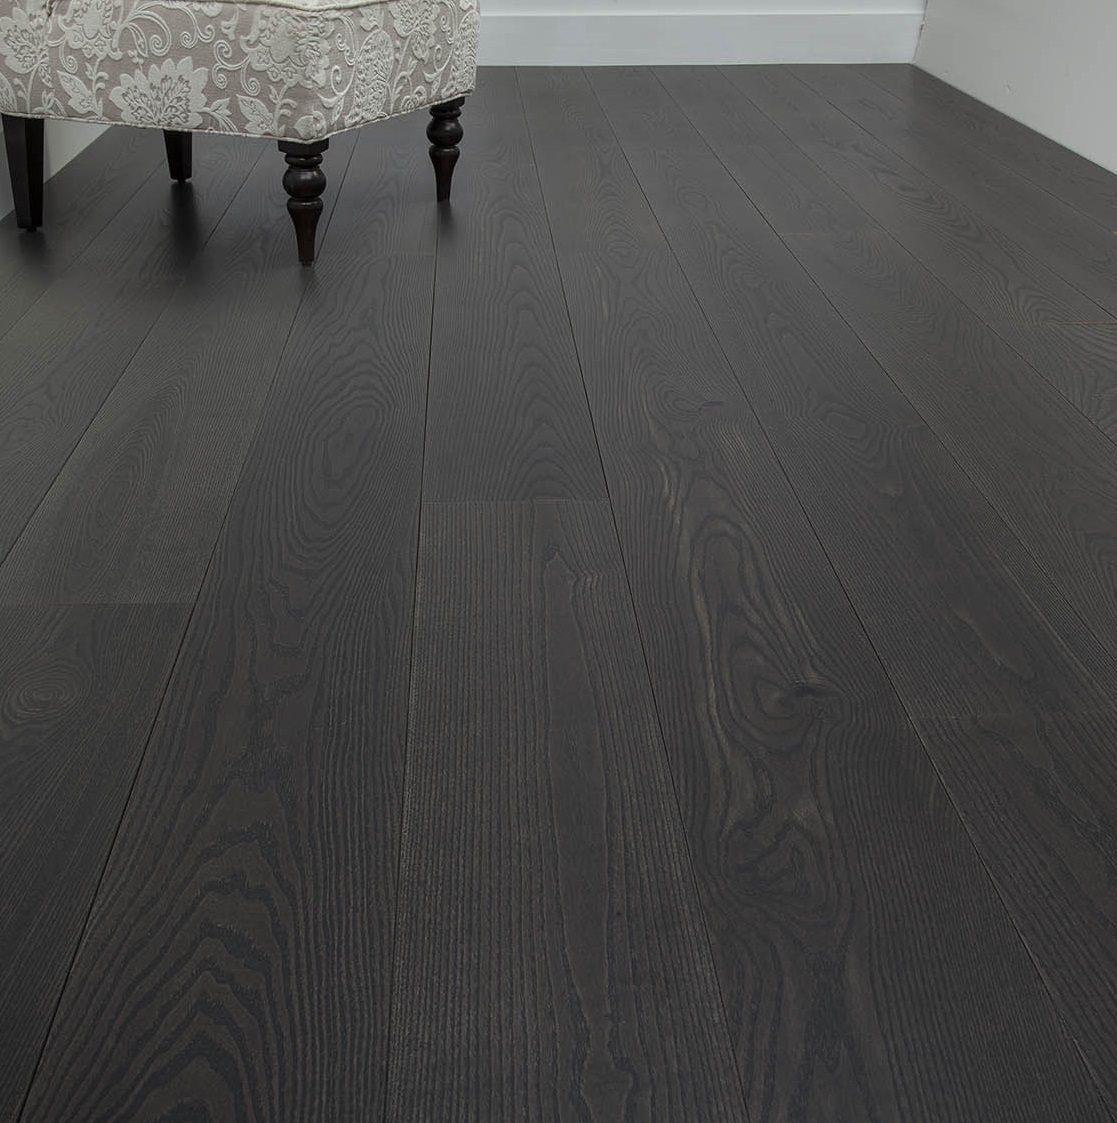 Dark Wood Floor And Engineered Flooring From Carlisle Wide Plank Floors